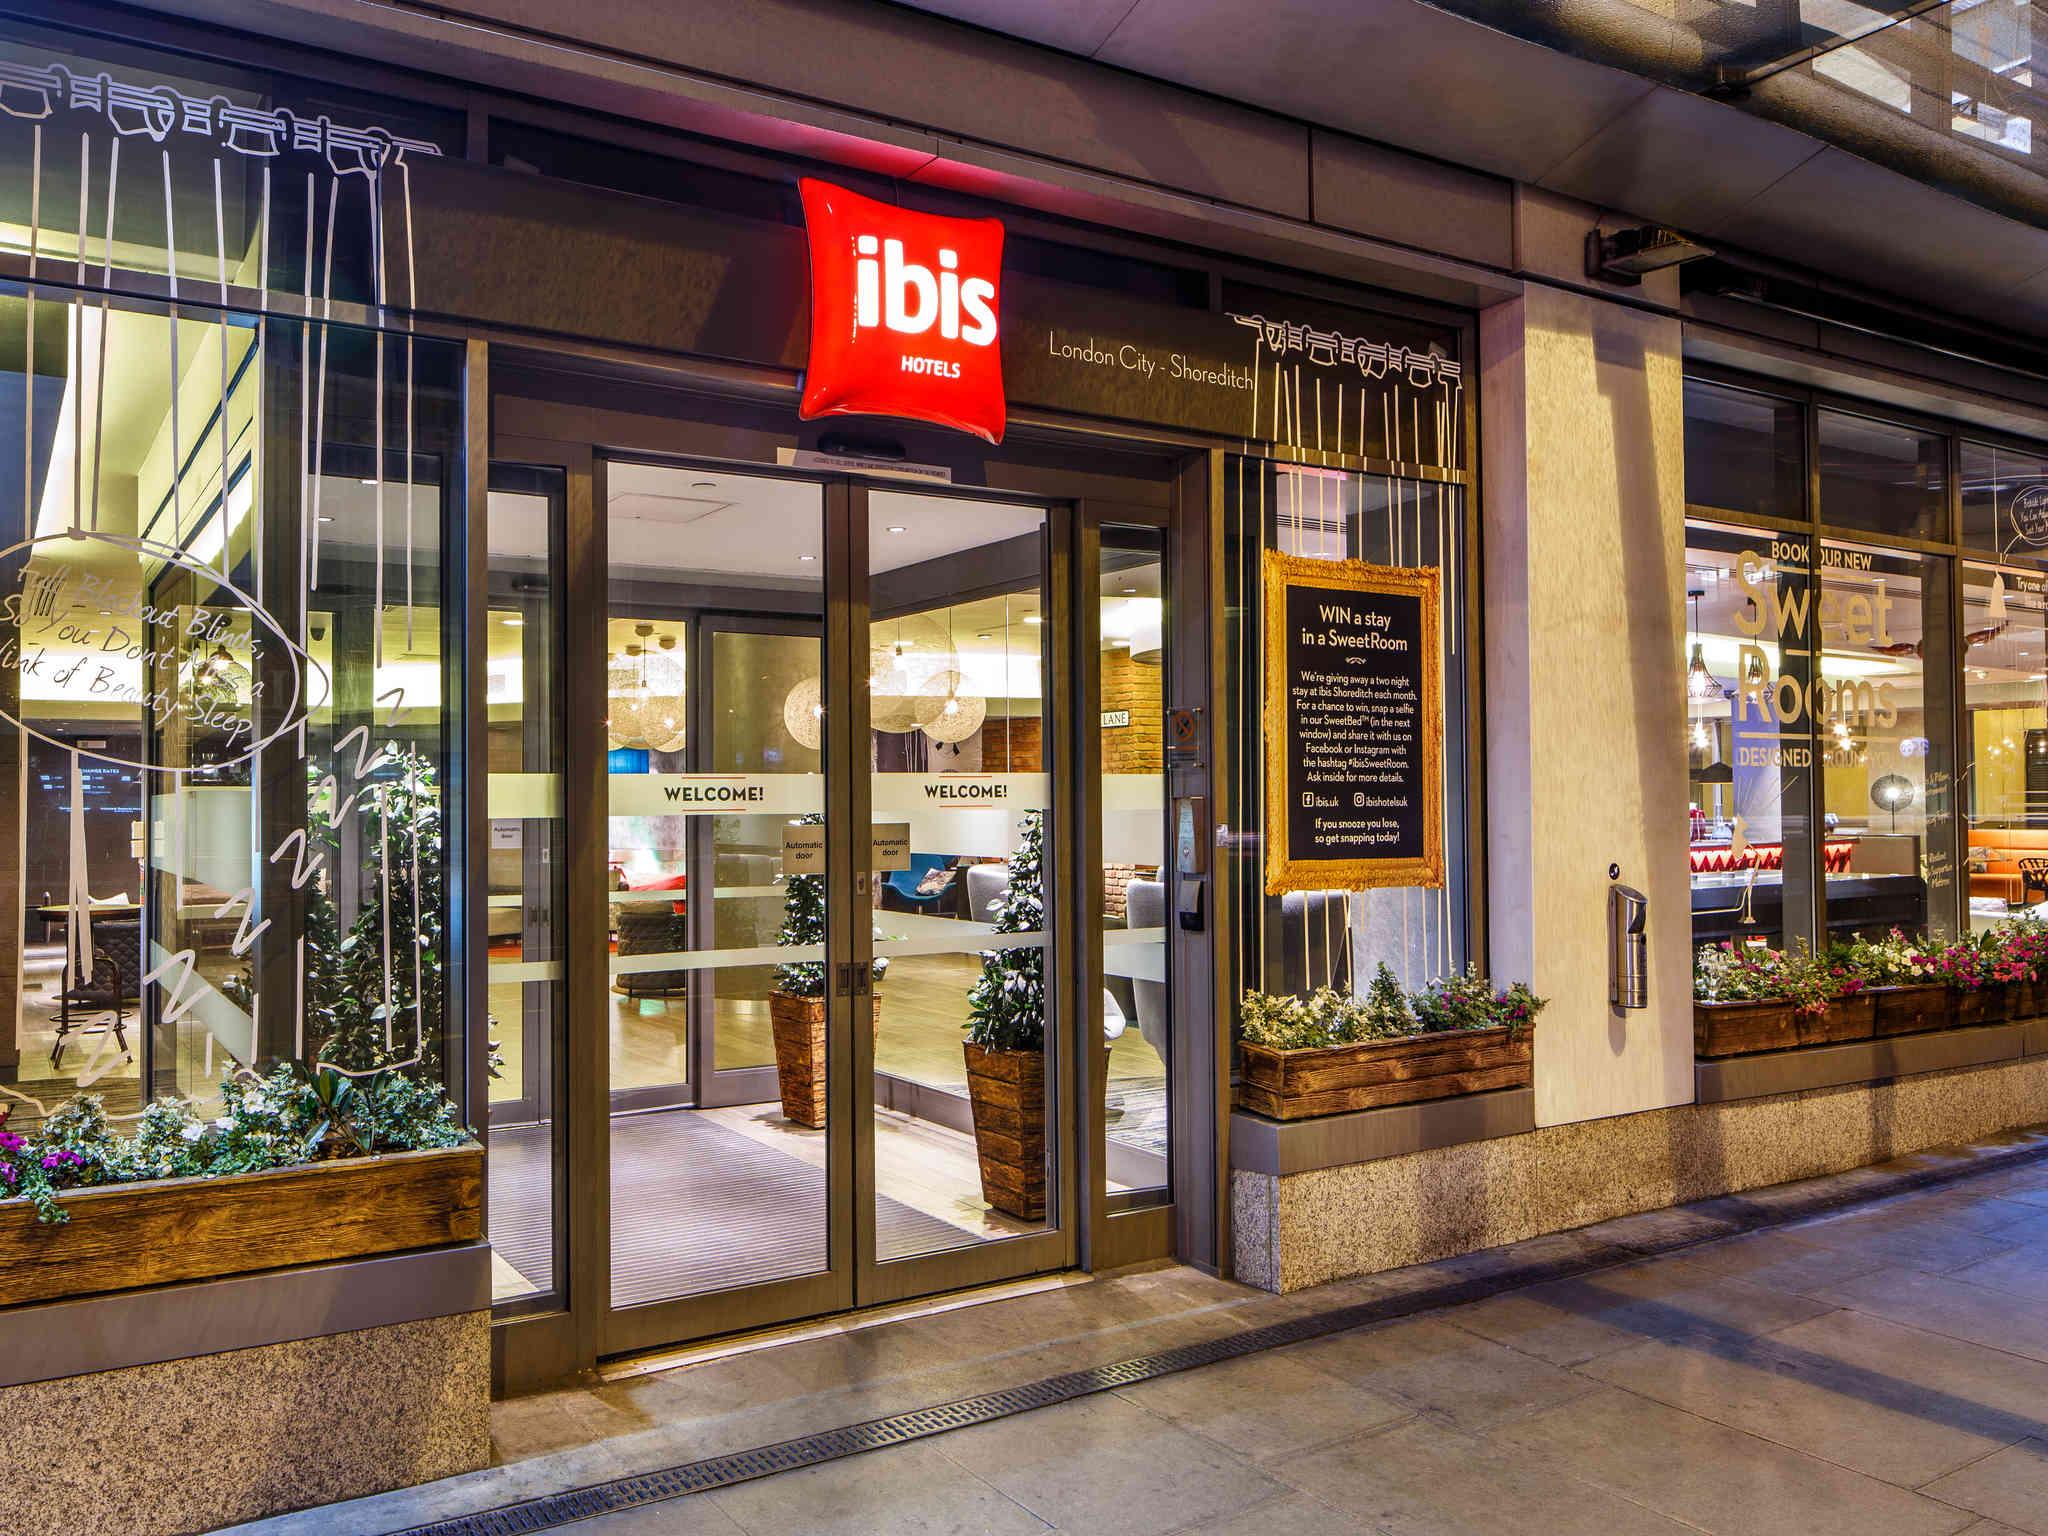 فندق - فندق إيبيس ibis لندن سيتي -شورديتش